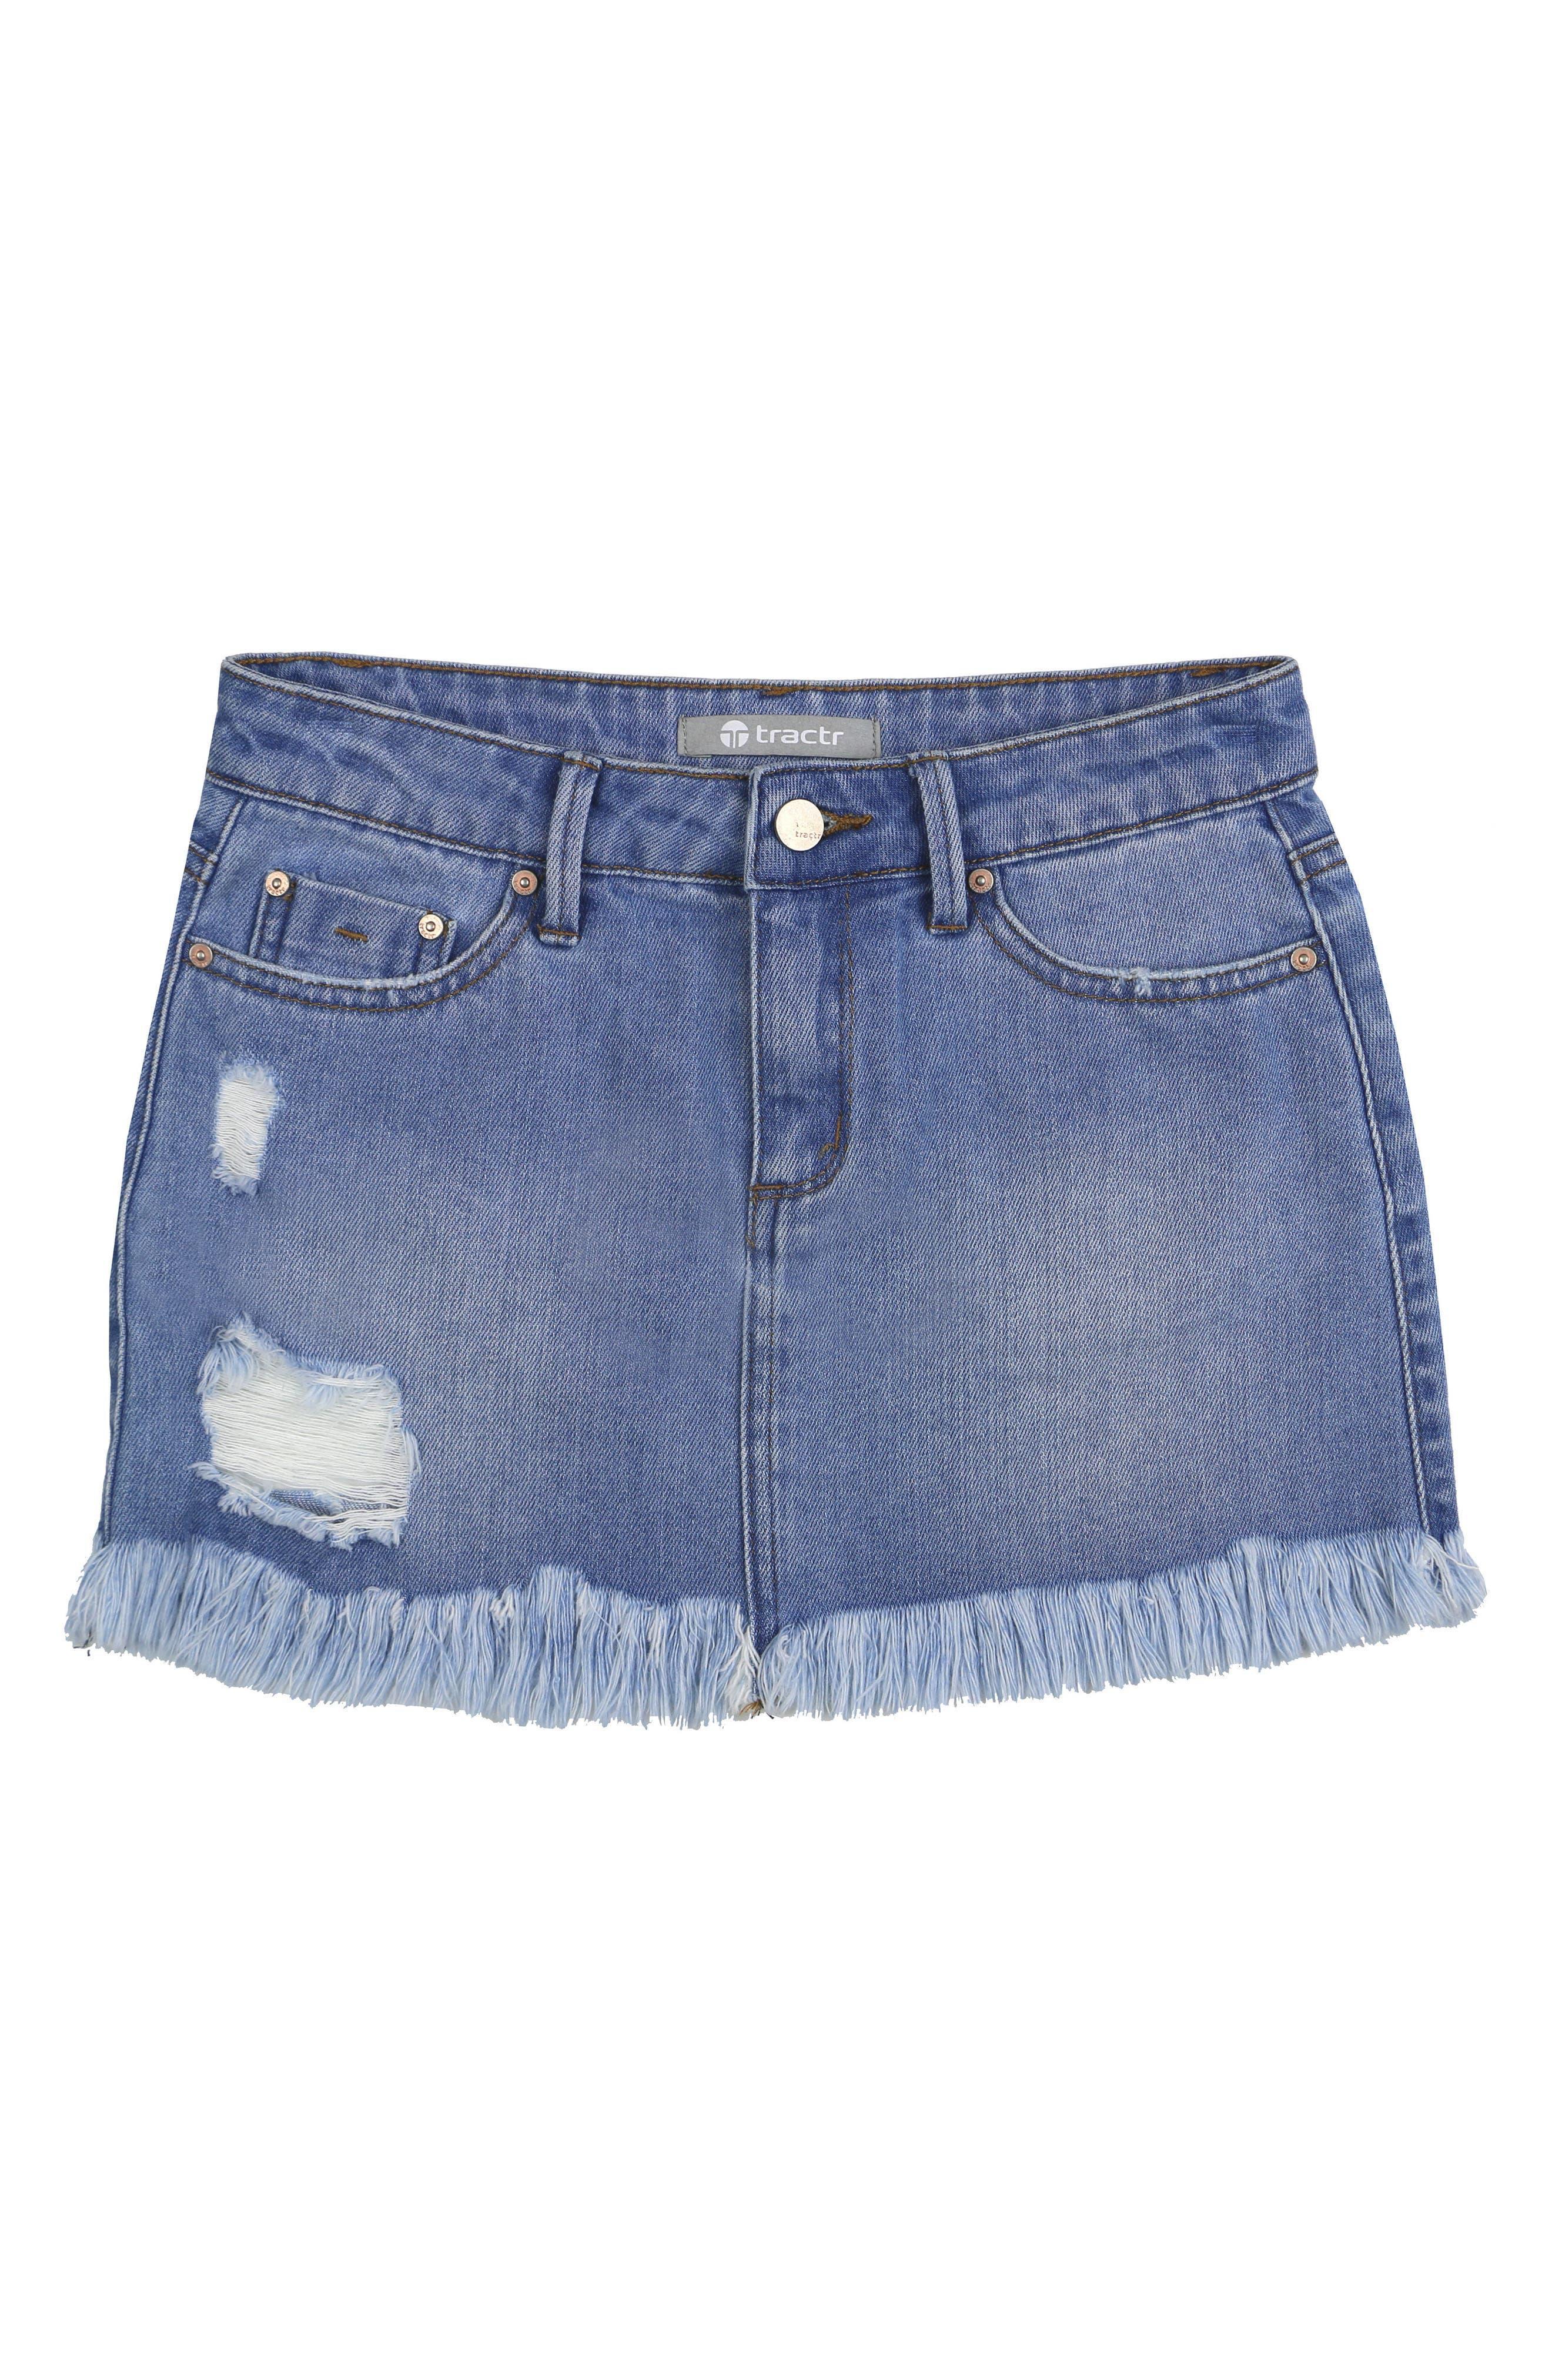 Alternate Image 1 Selected - Tractr Distressed Denim Skirt (Big Girls)